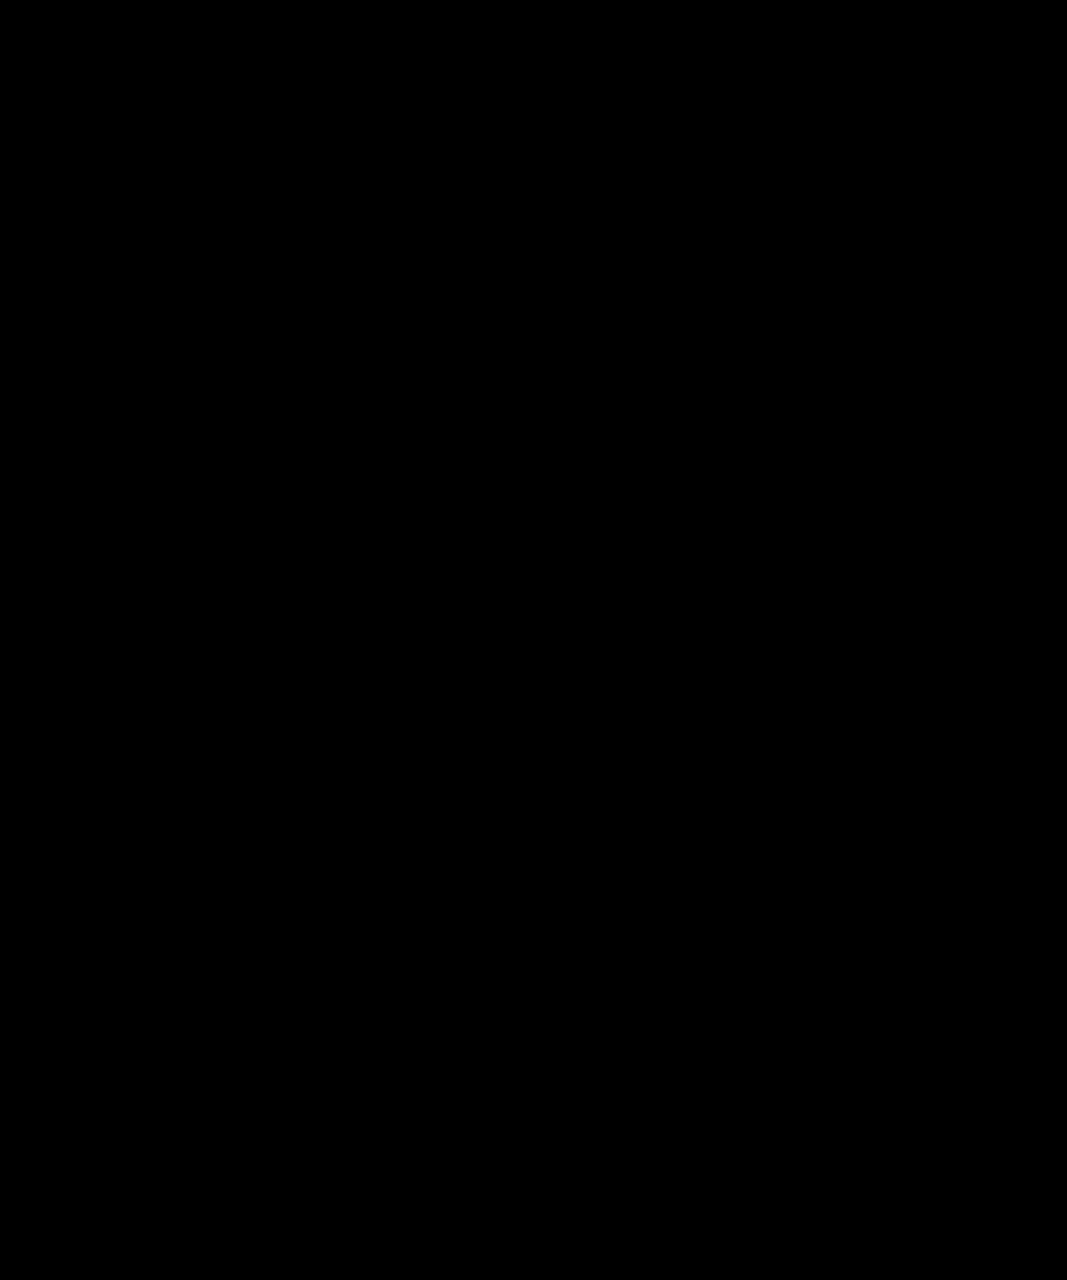 Scary Tree SVG Cut File